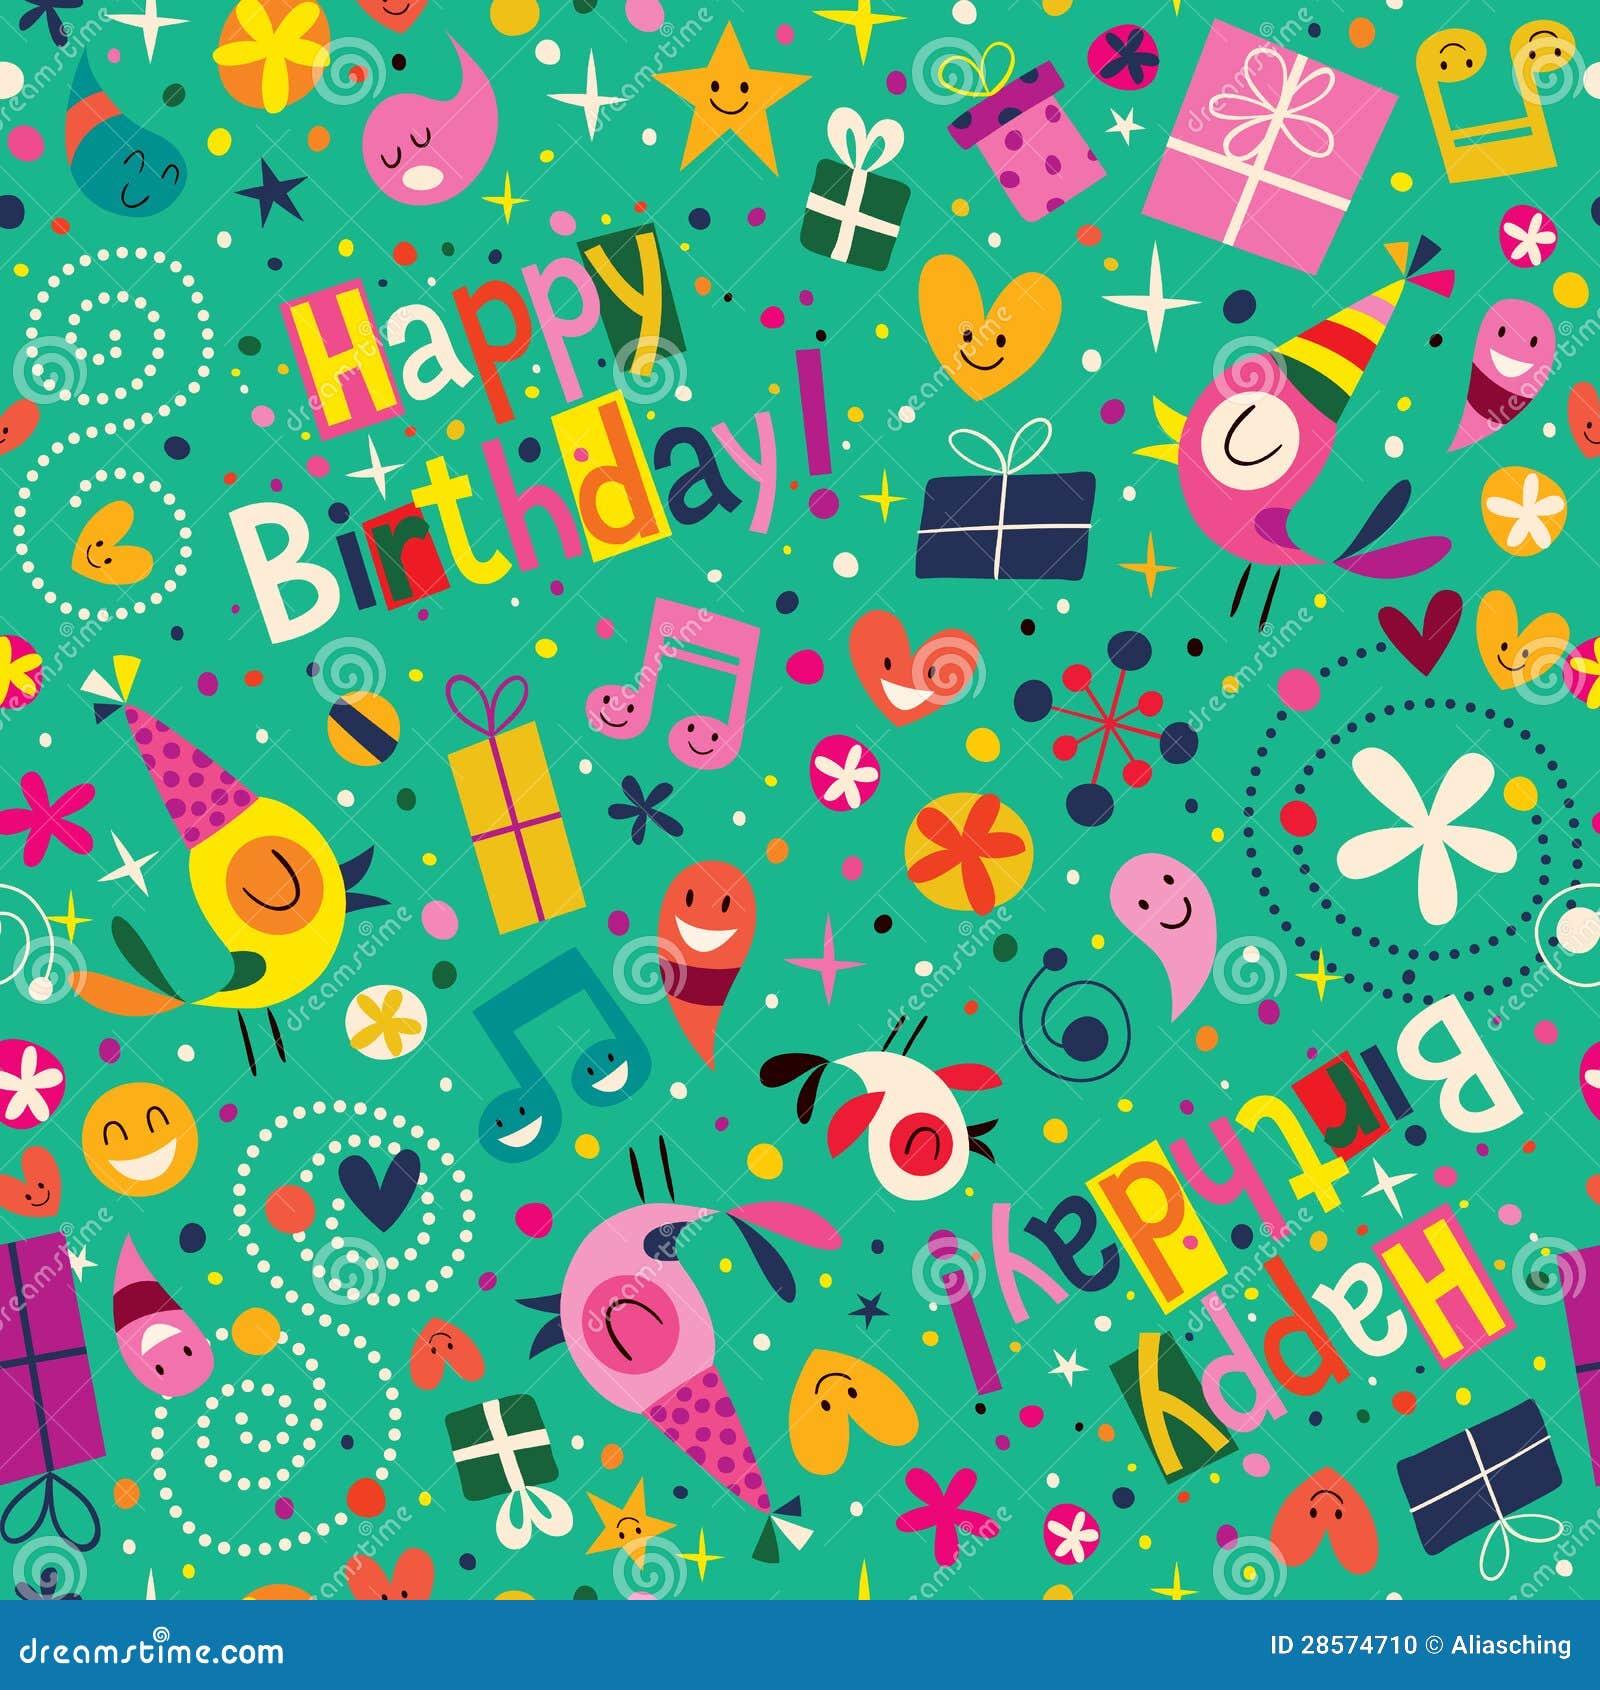 Birthday Invitation Content is beautiful invitations template